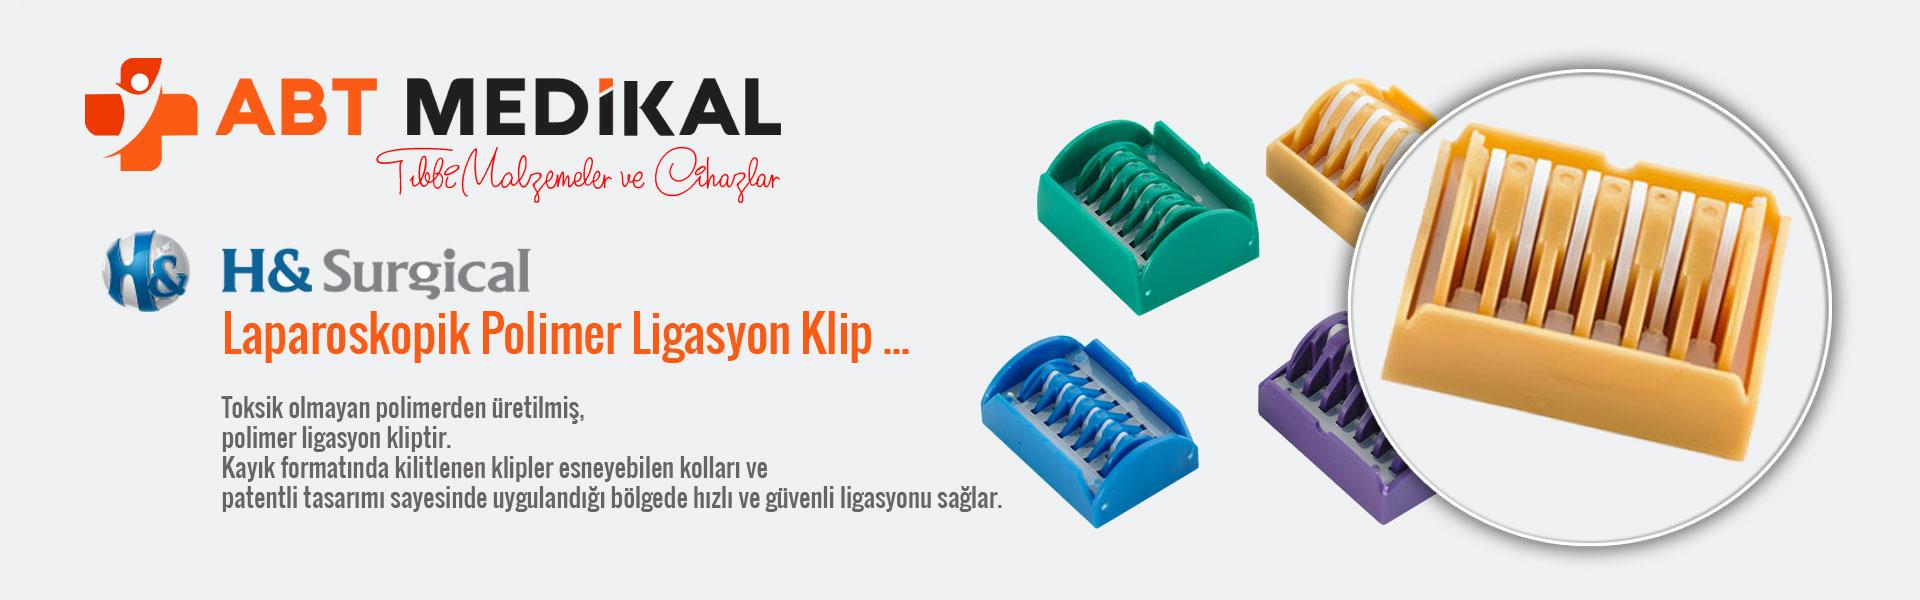 laparoskopik-polimer-ligasyon-klip-endoskopik-polimer-klip